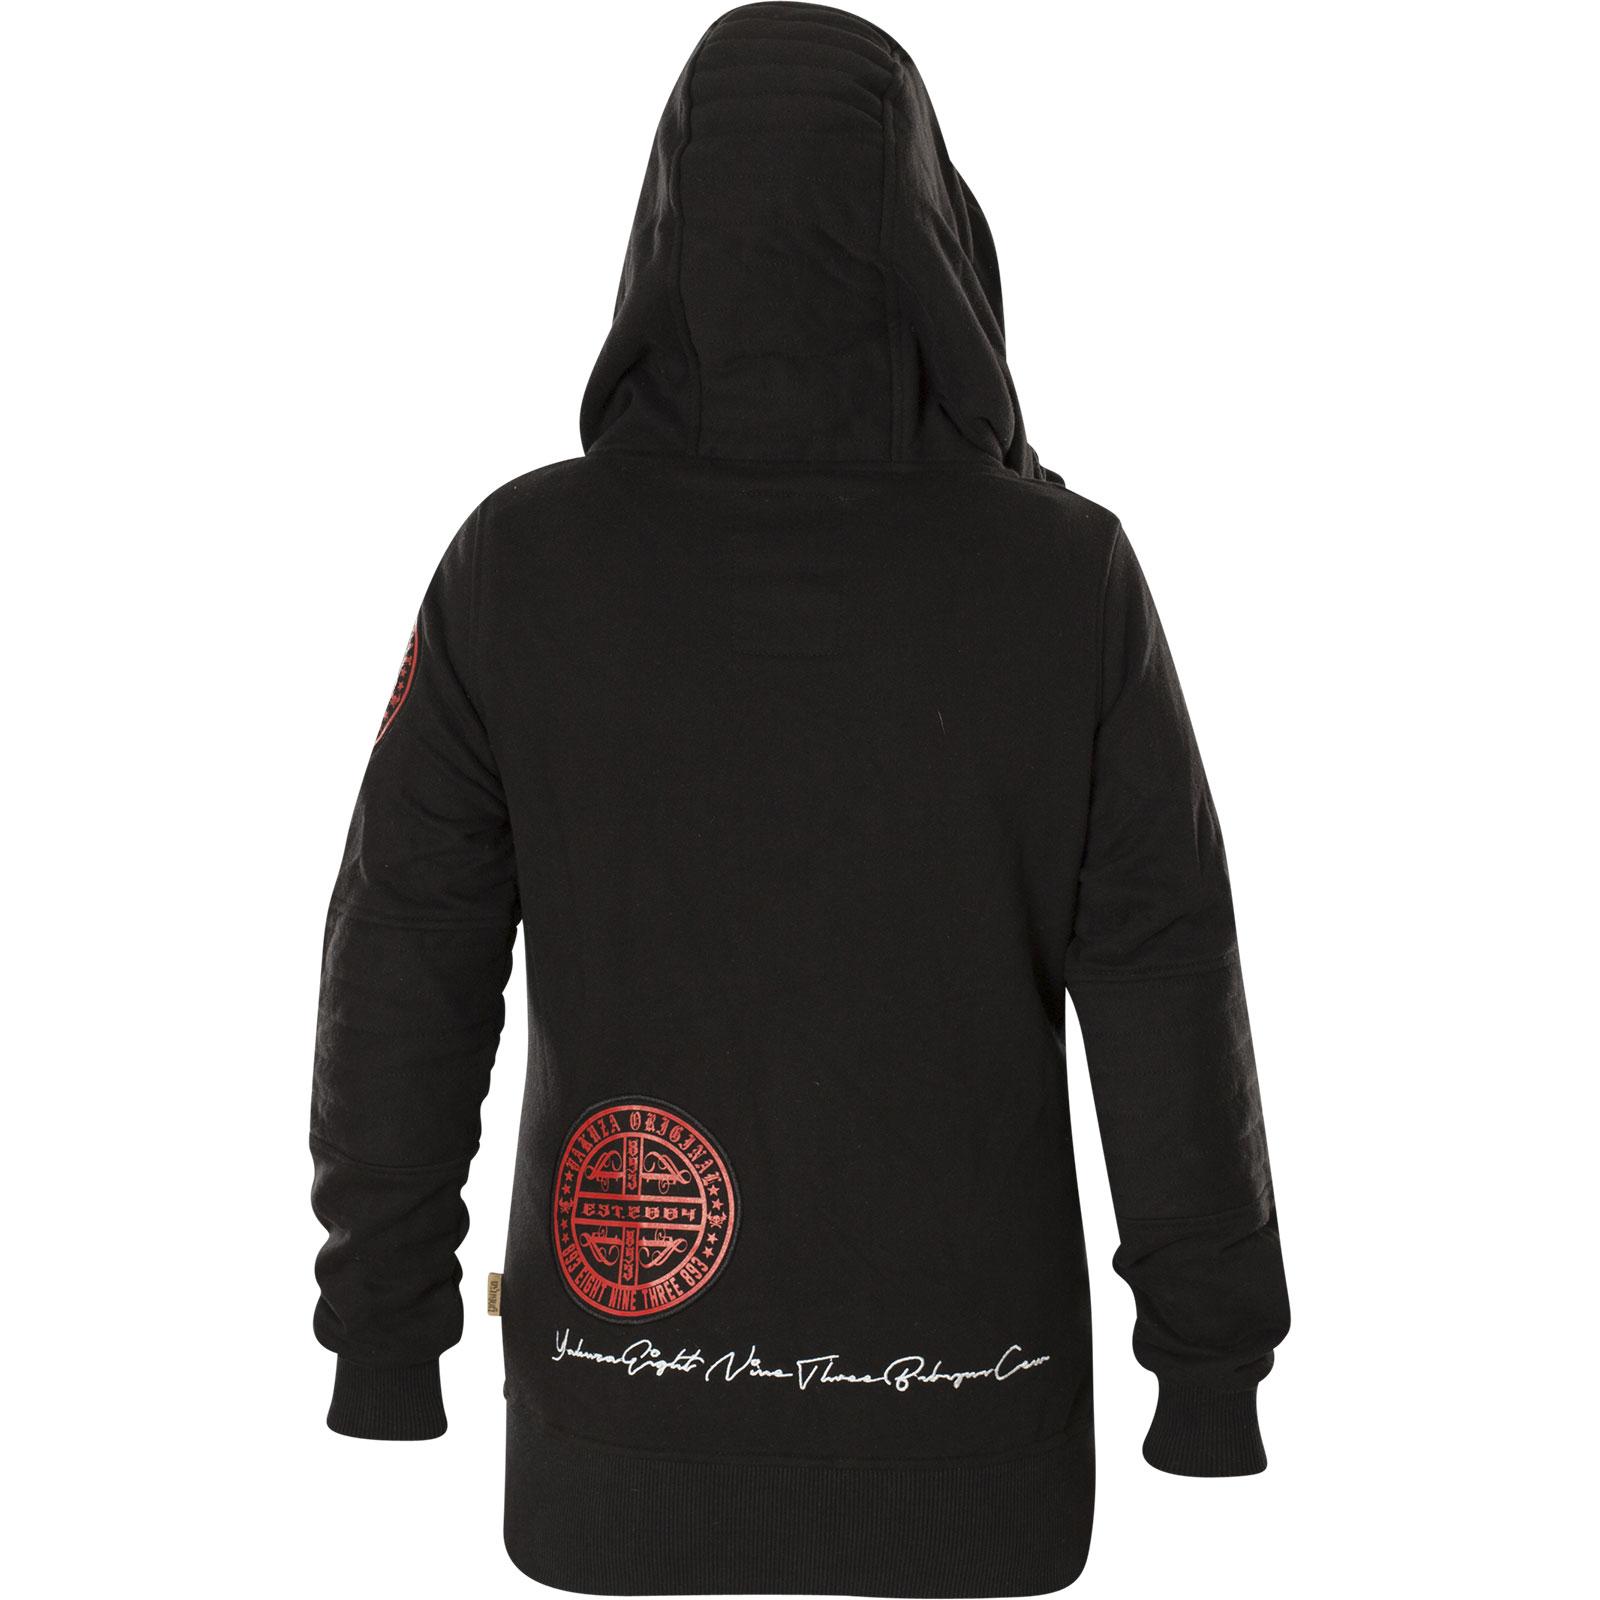 Yakuza Damen Daily Skull High Neck Zip Hoodie GHZB 11109 Black Schwarz